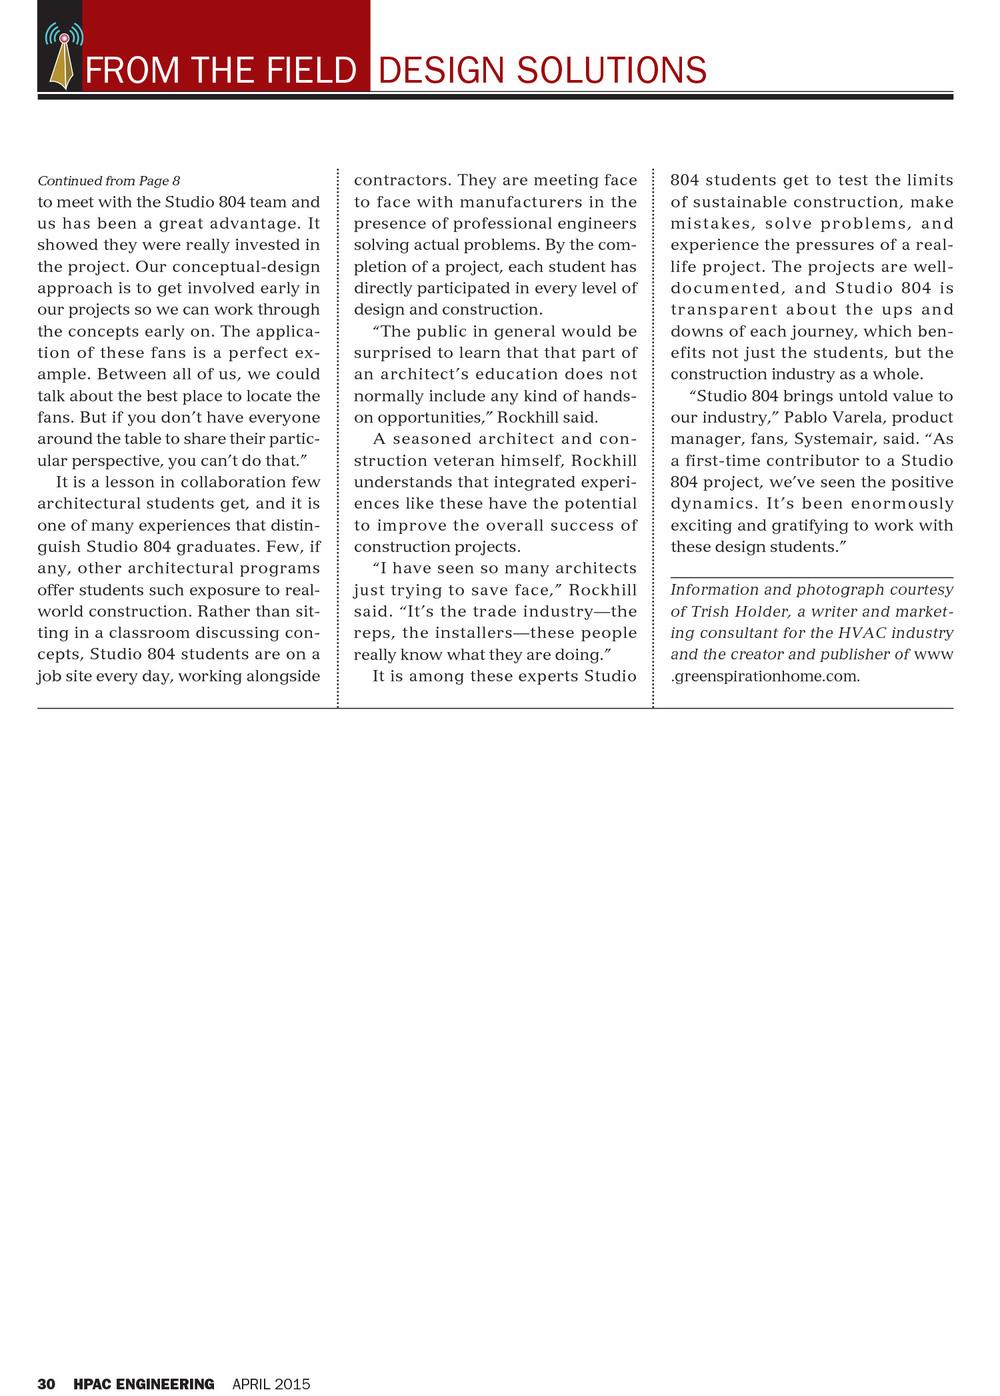 trish-holder-feature-article-hvac-marketing-communications-portfolio-6-page-3.jpg